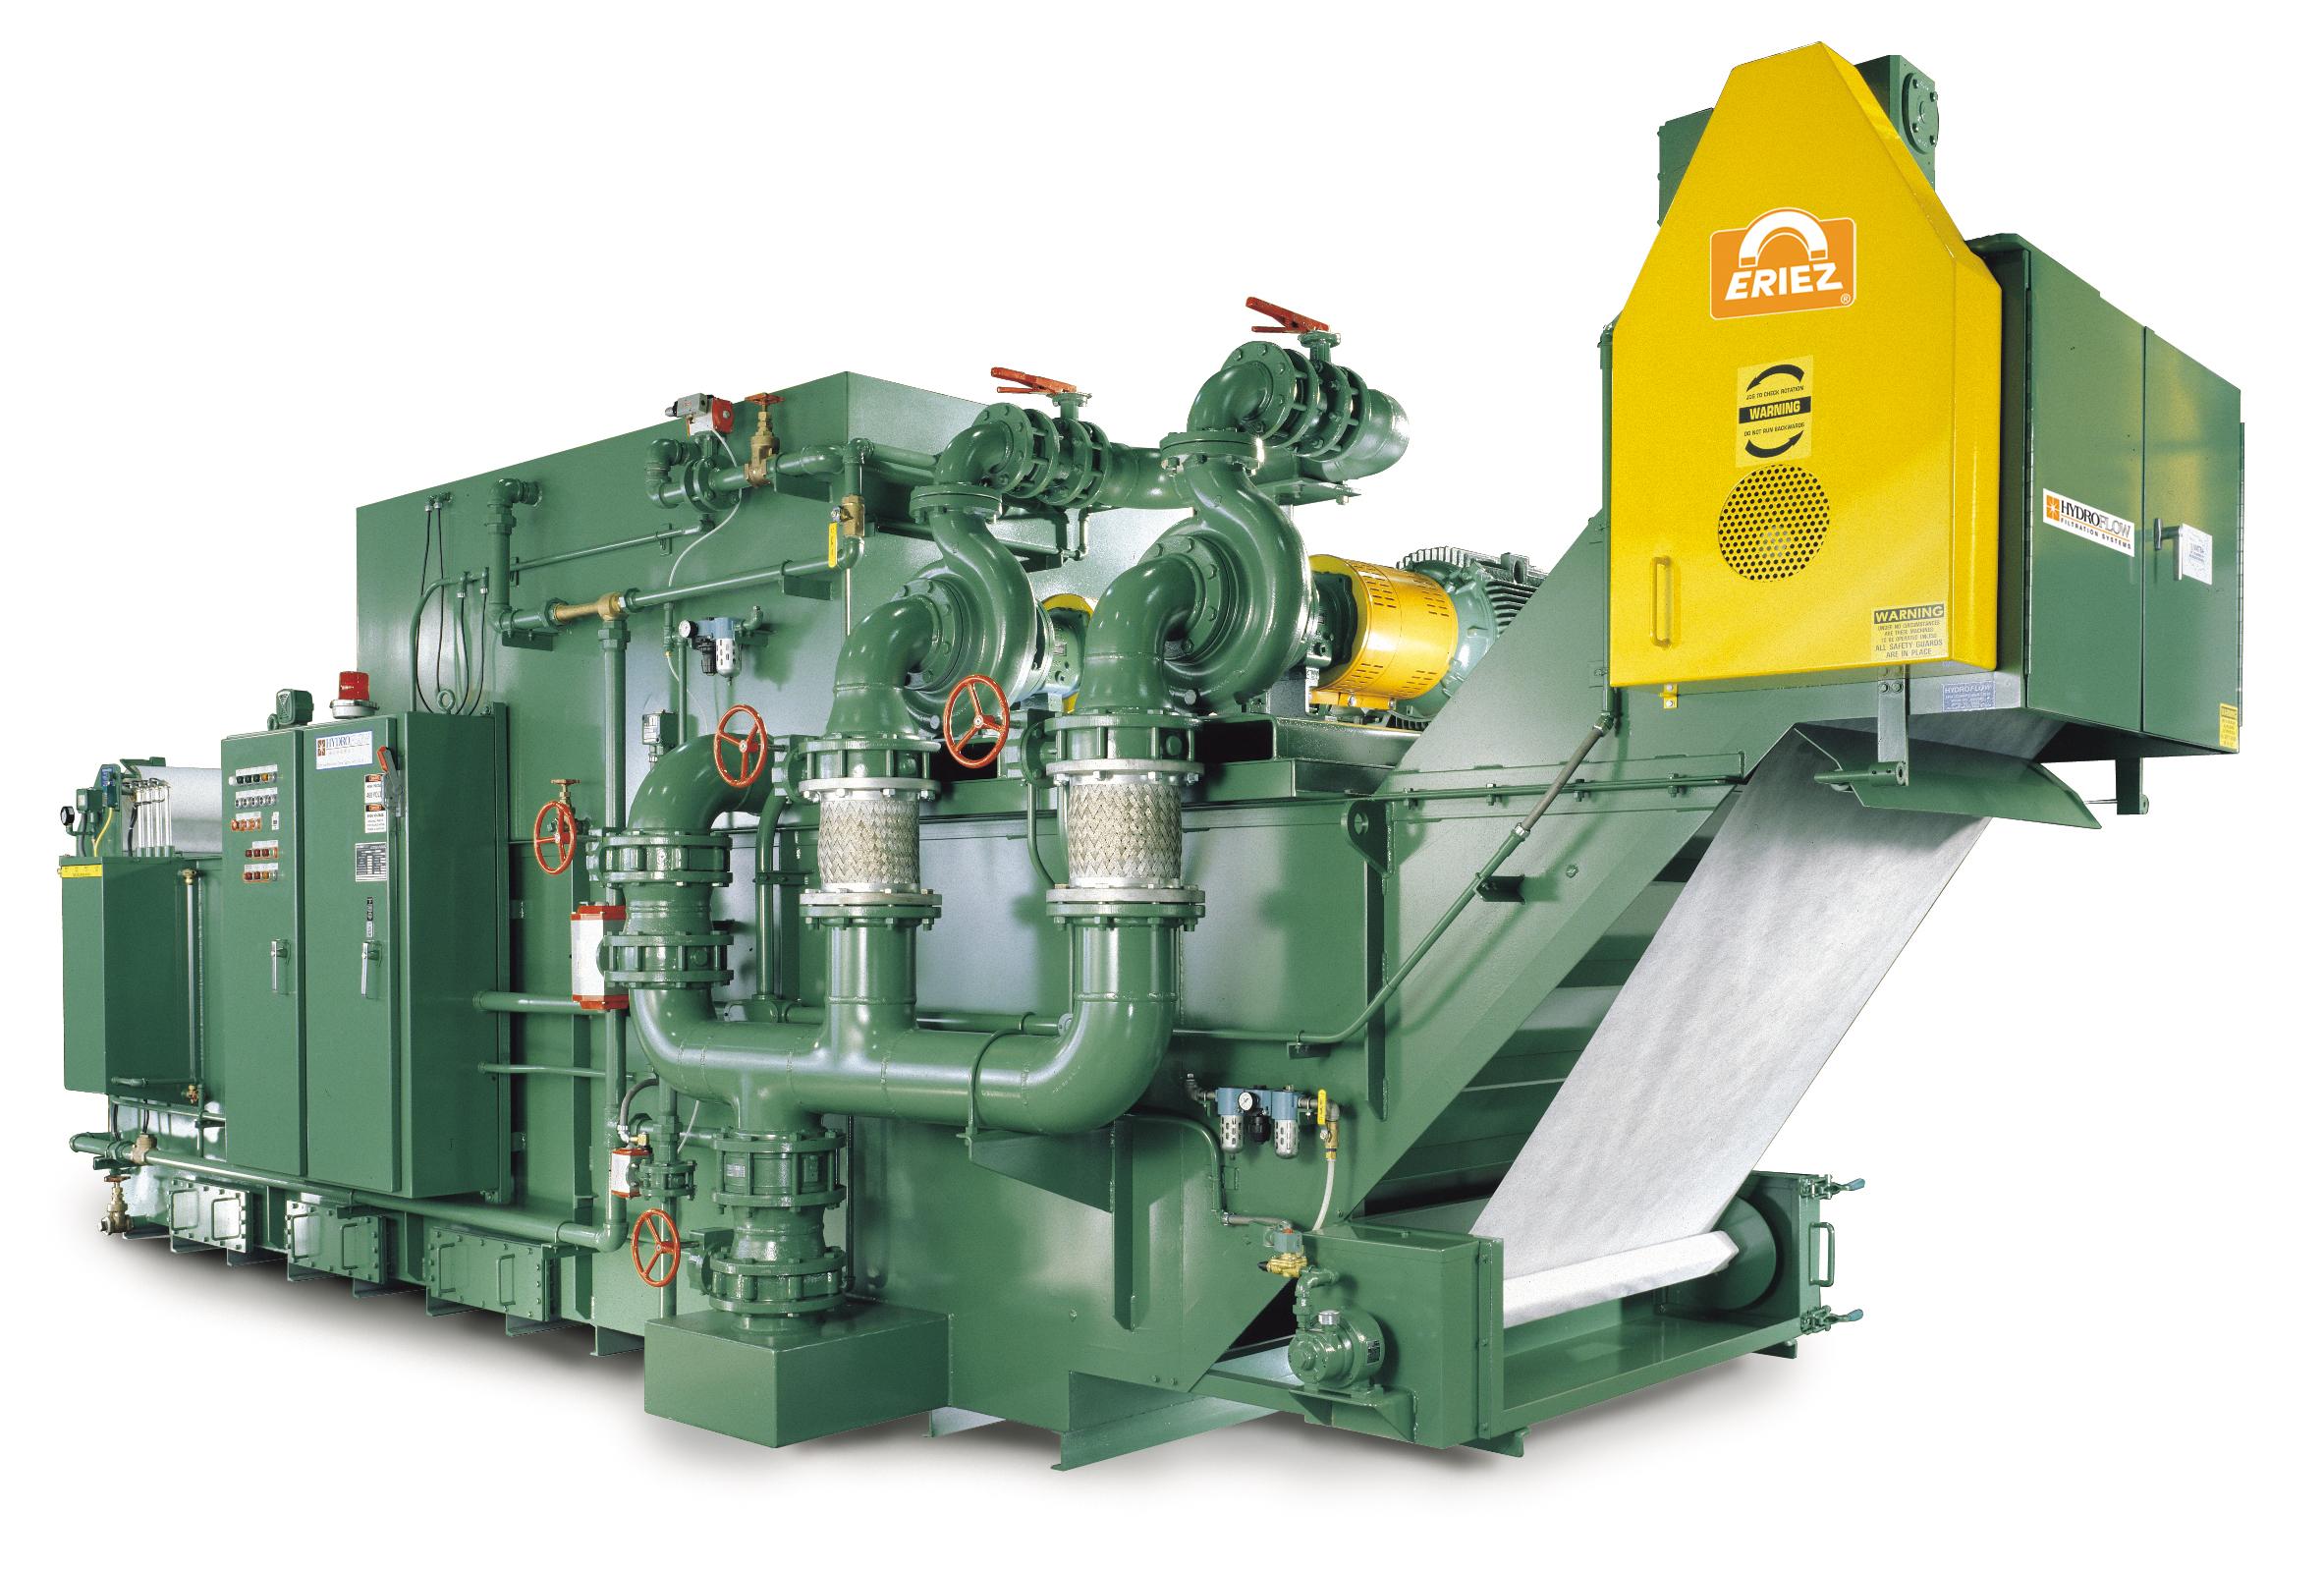 Eriez 174 Hydroflow 174 Vacuum Filtration Systems Provide